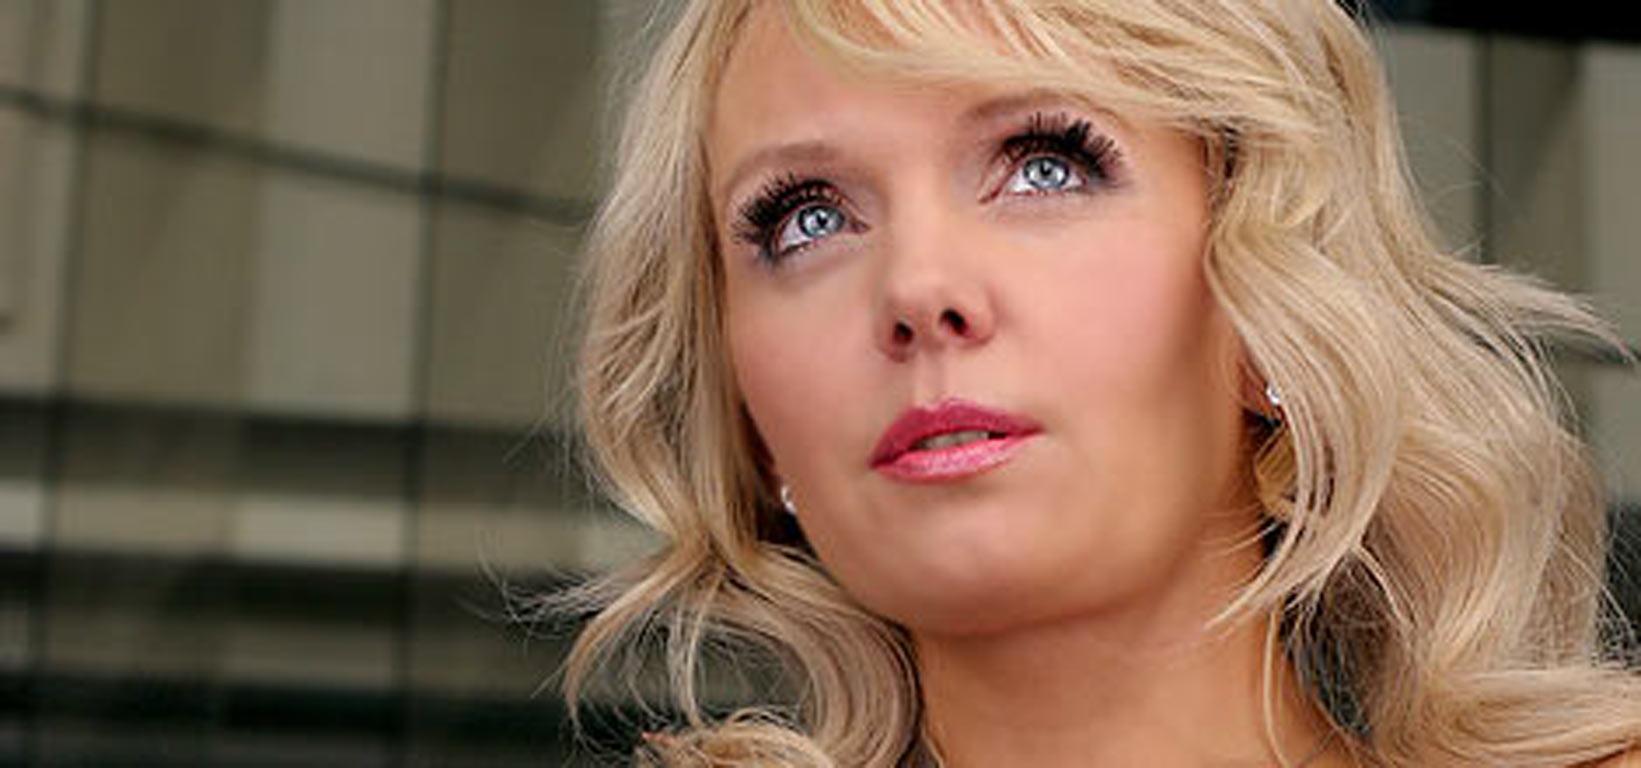 Валерия певица фото макияжа